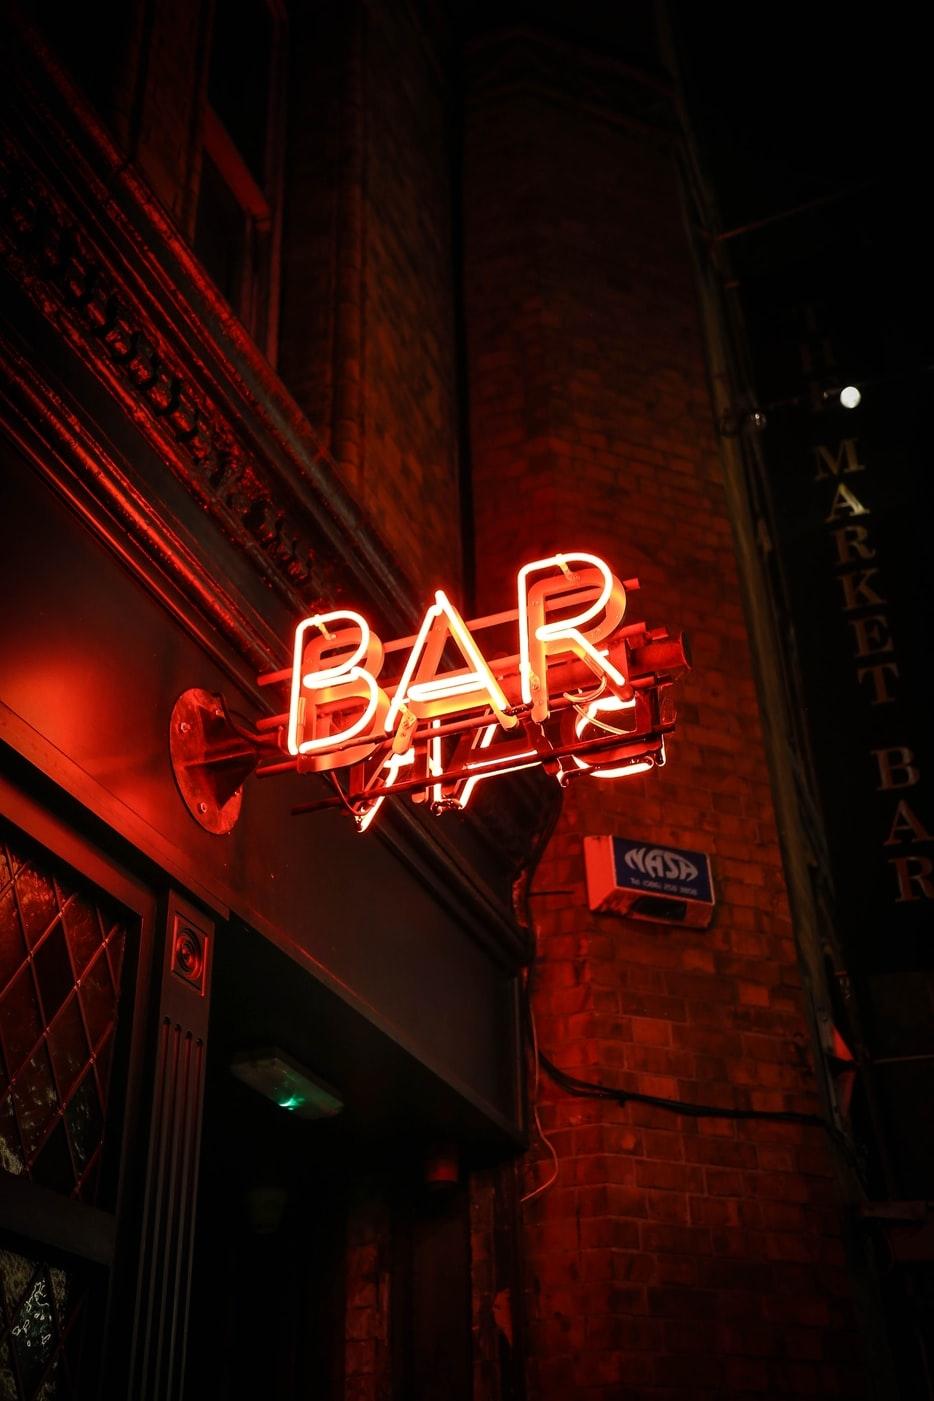 『MyHome Bar』開店します